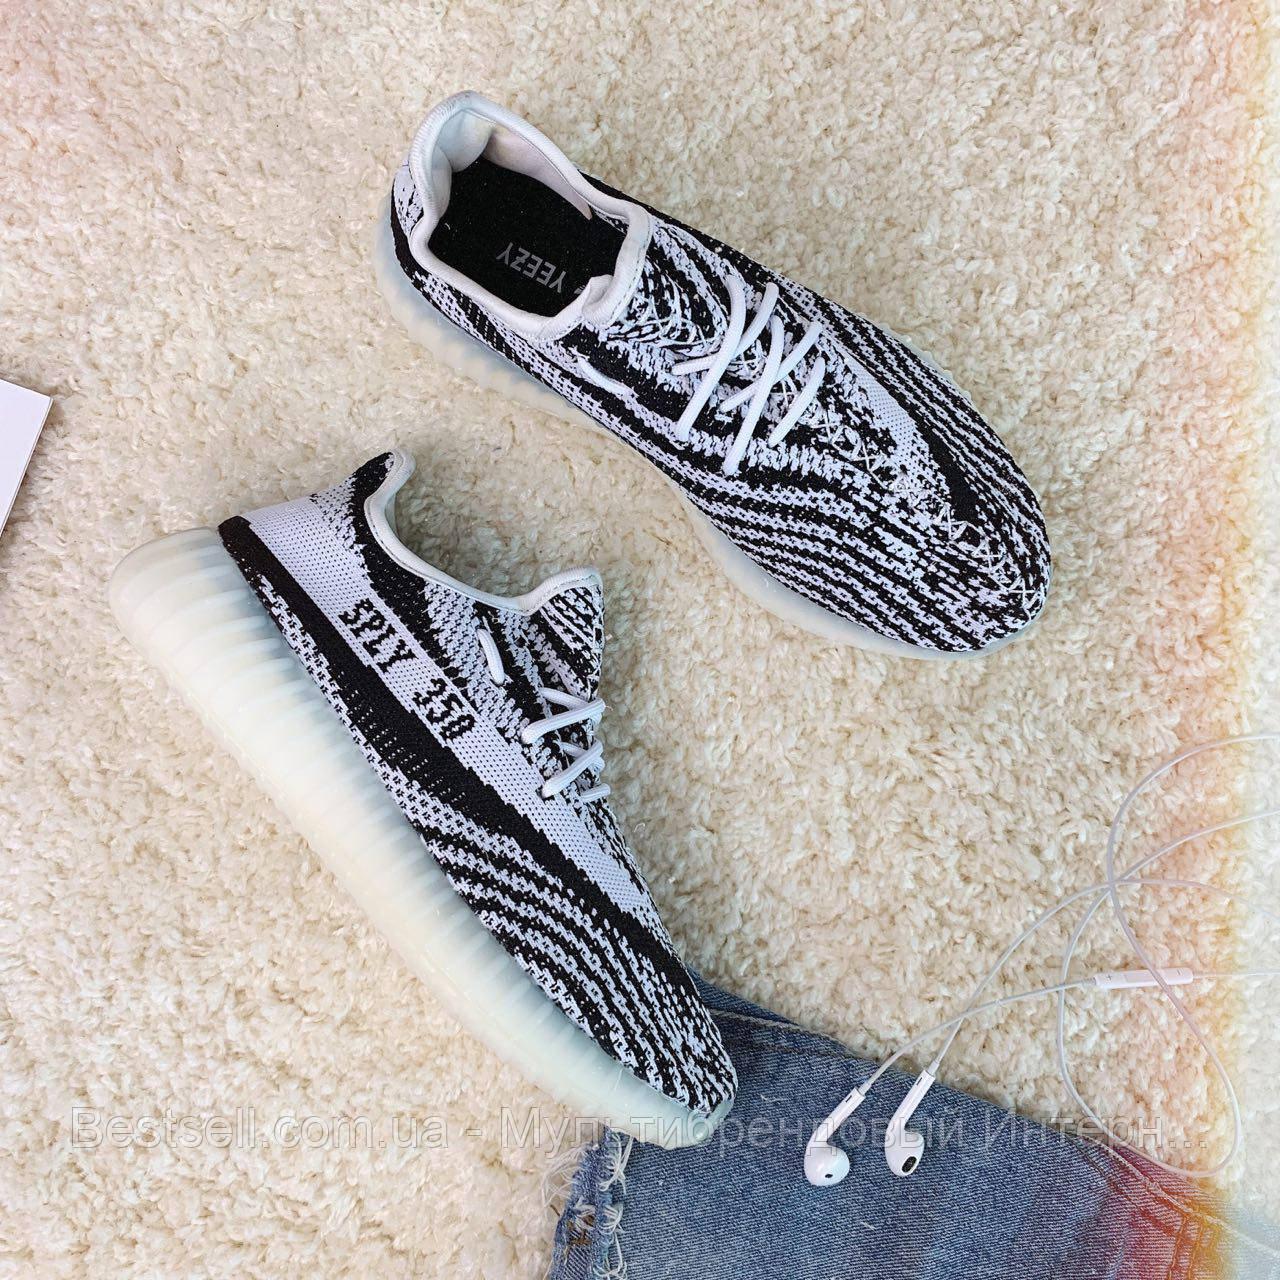 Кроссовки Adidas Yeezy Boost  30784 ⏩ [ 37 последний]